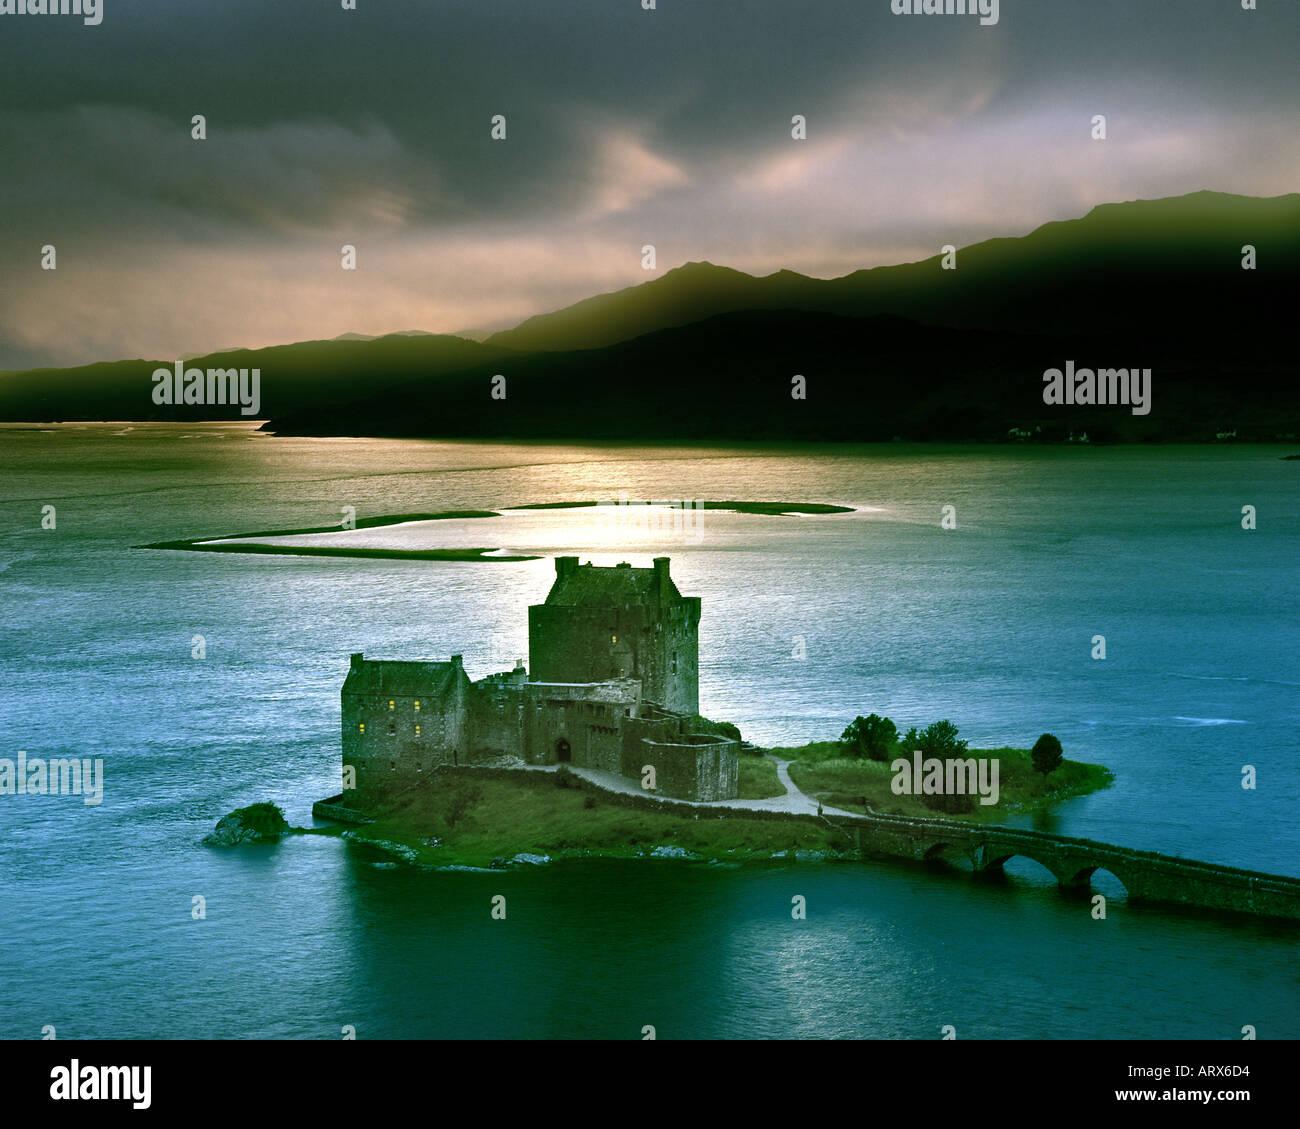 GB - SCOTLAND: Eilean Donan Castle Loch Duich in the Highlands Stock Photo